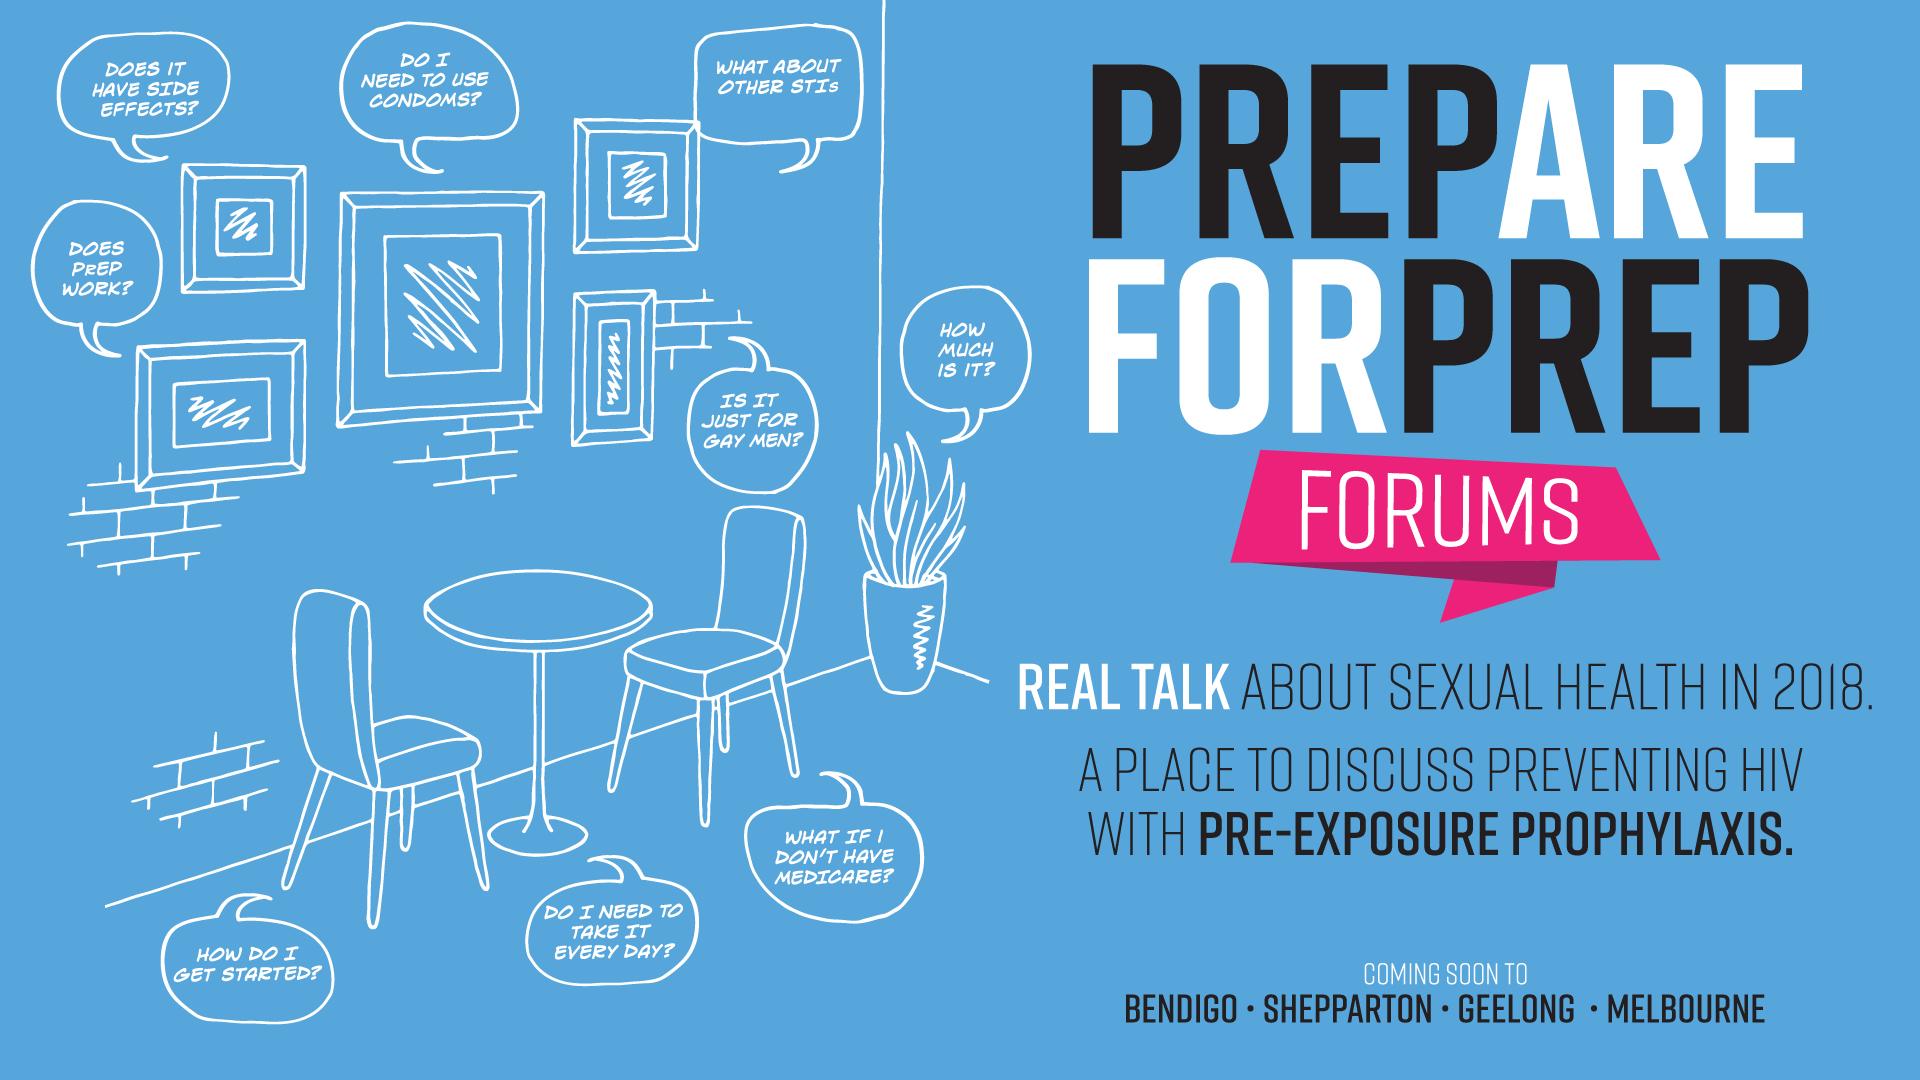 prepareforprep-web.png